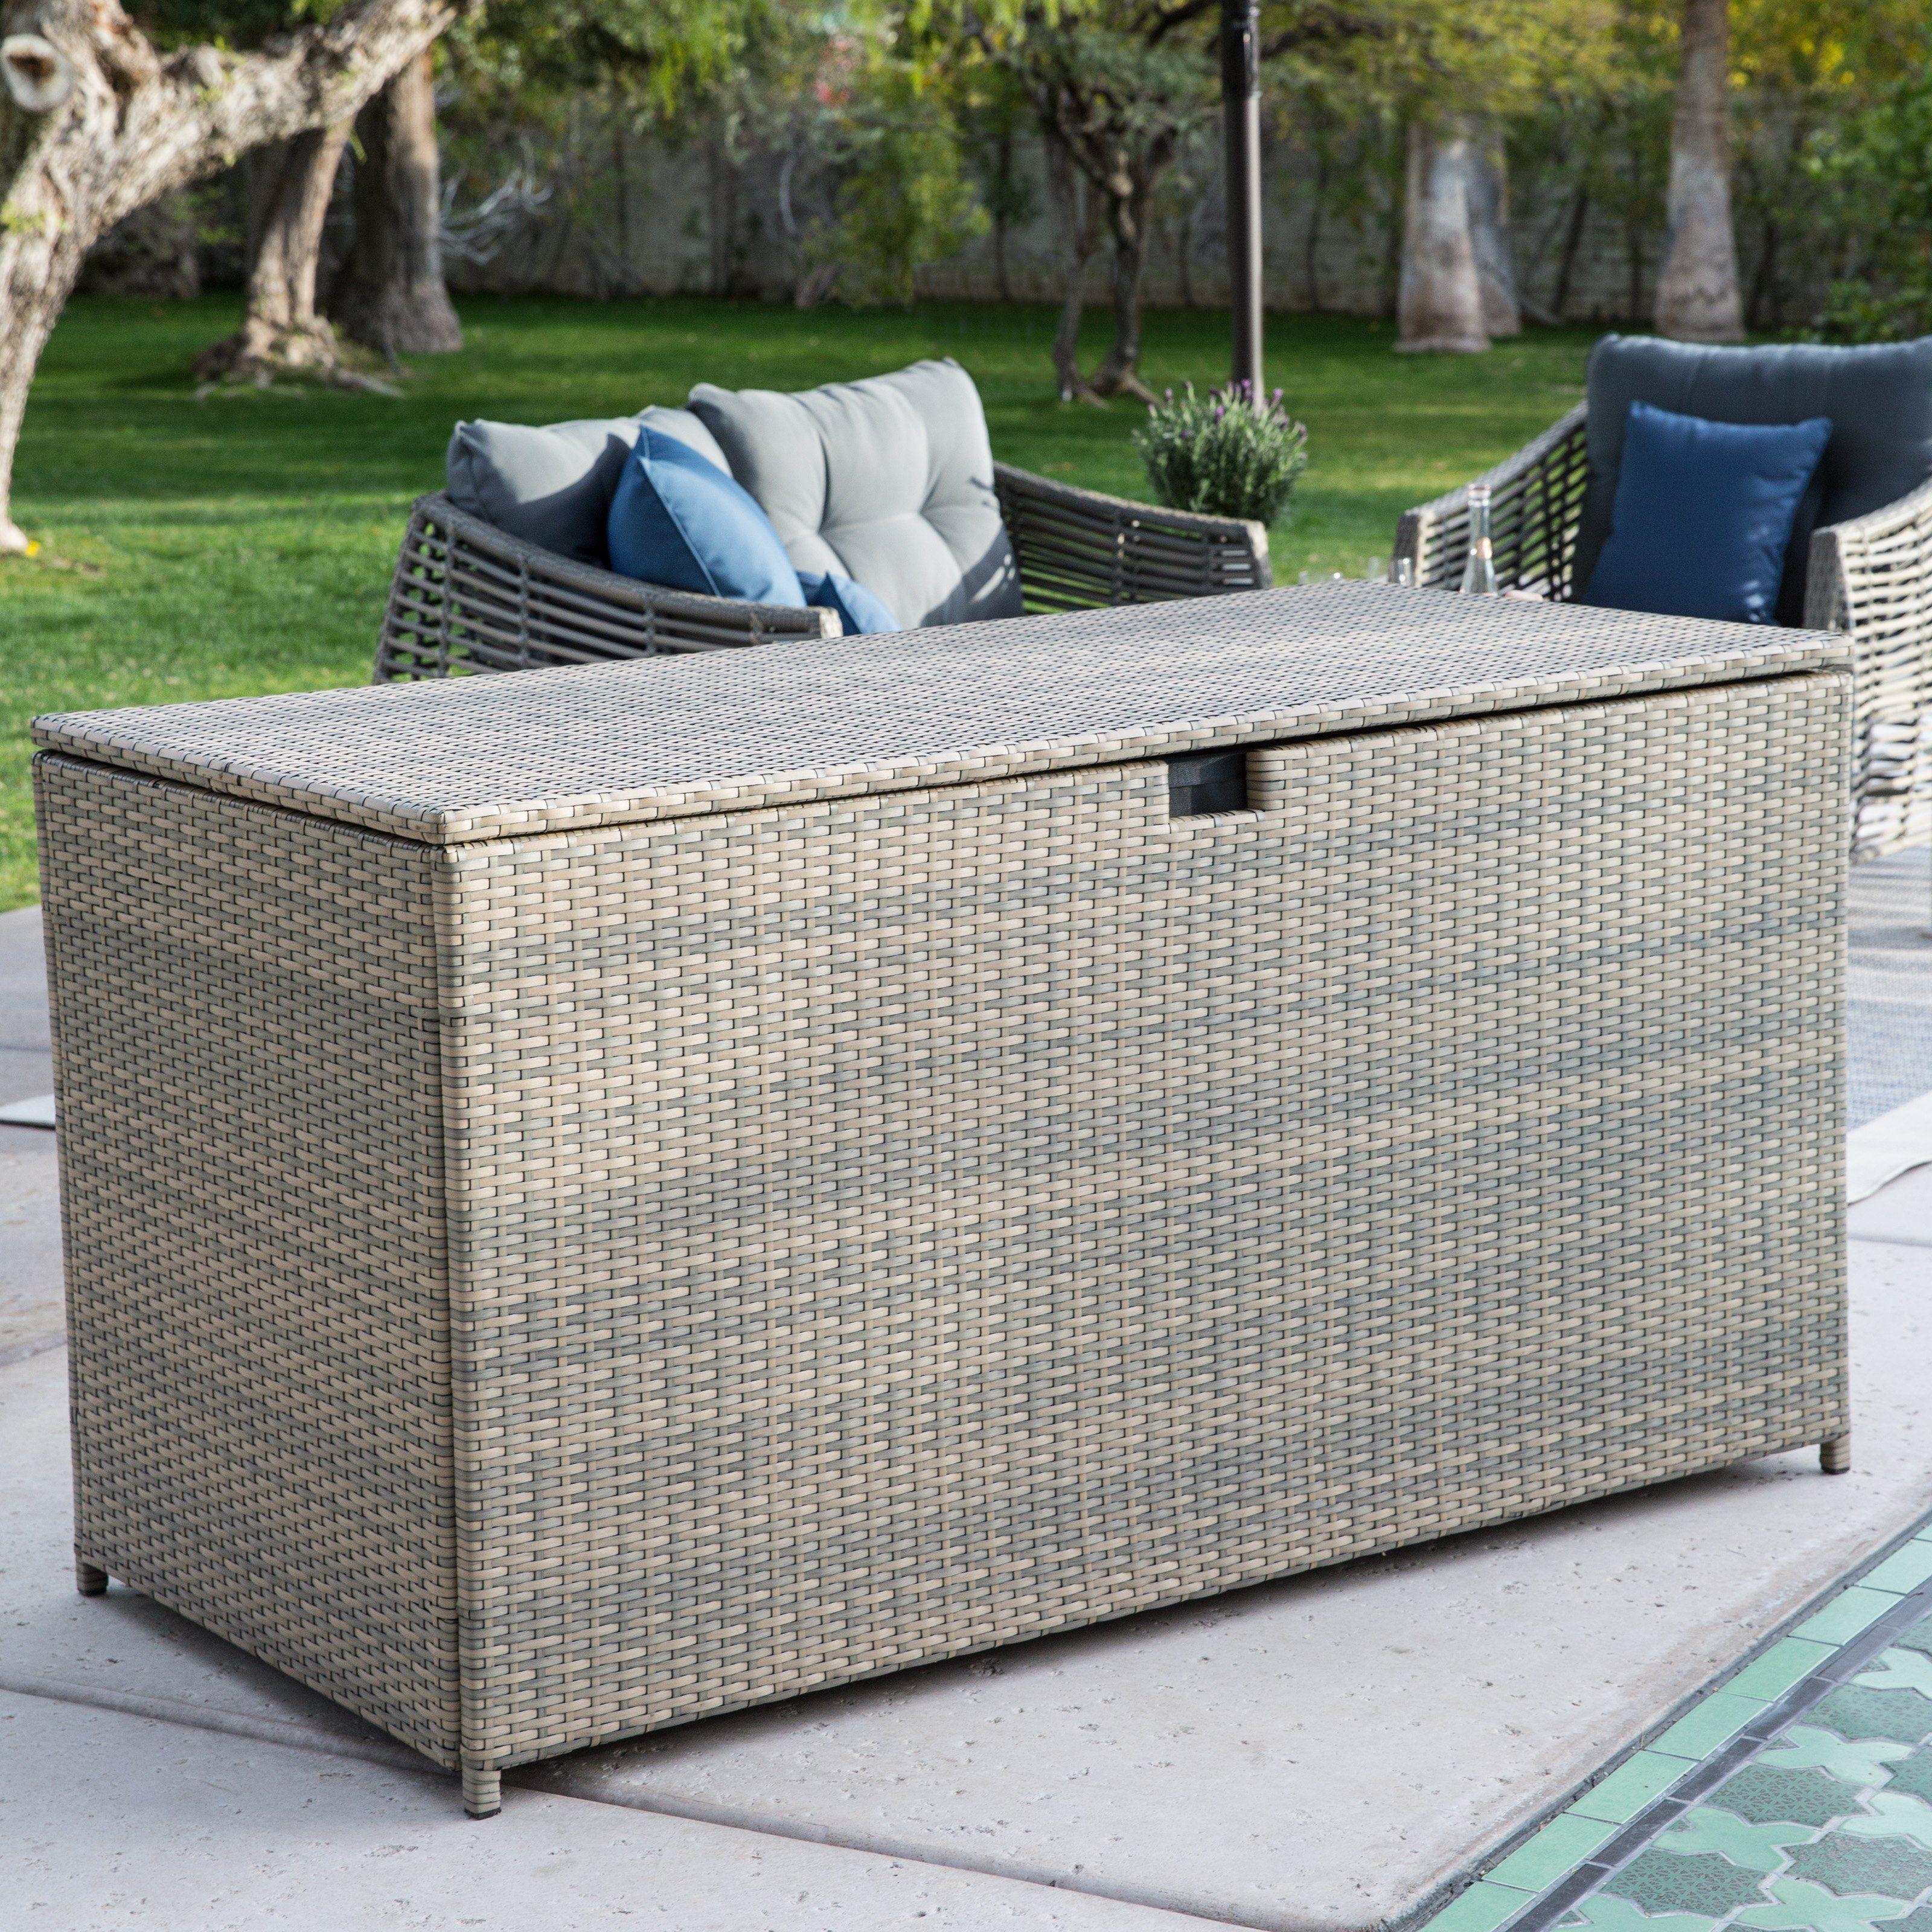 Belham Living Kambree All Weather Wicker 190 Gallon Deck Box Patio Storage Deck Box Storage Wicker Deck Box